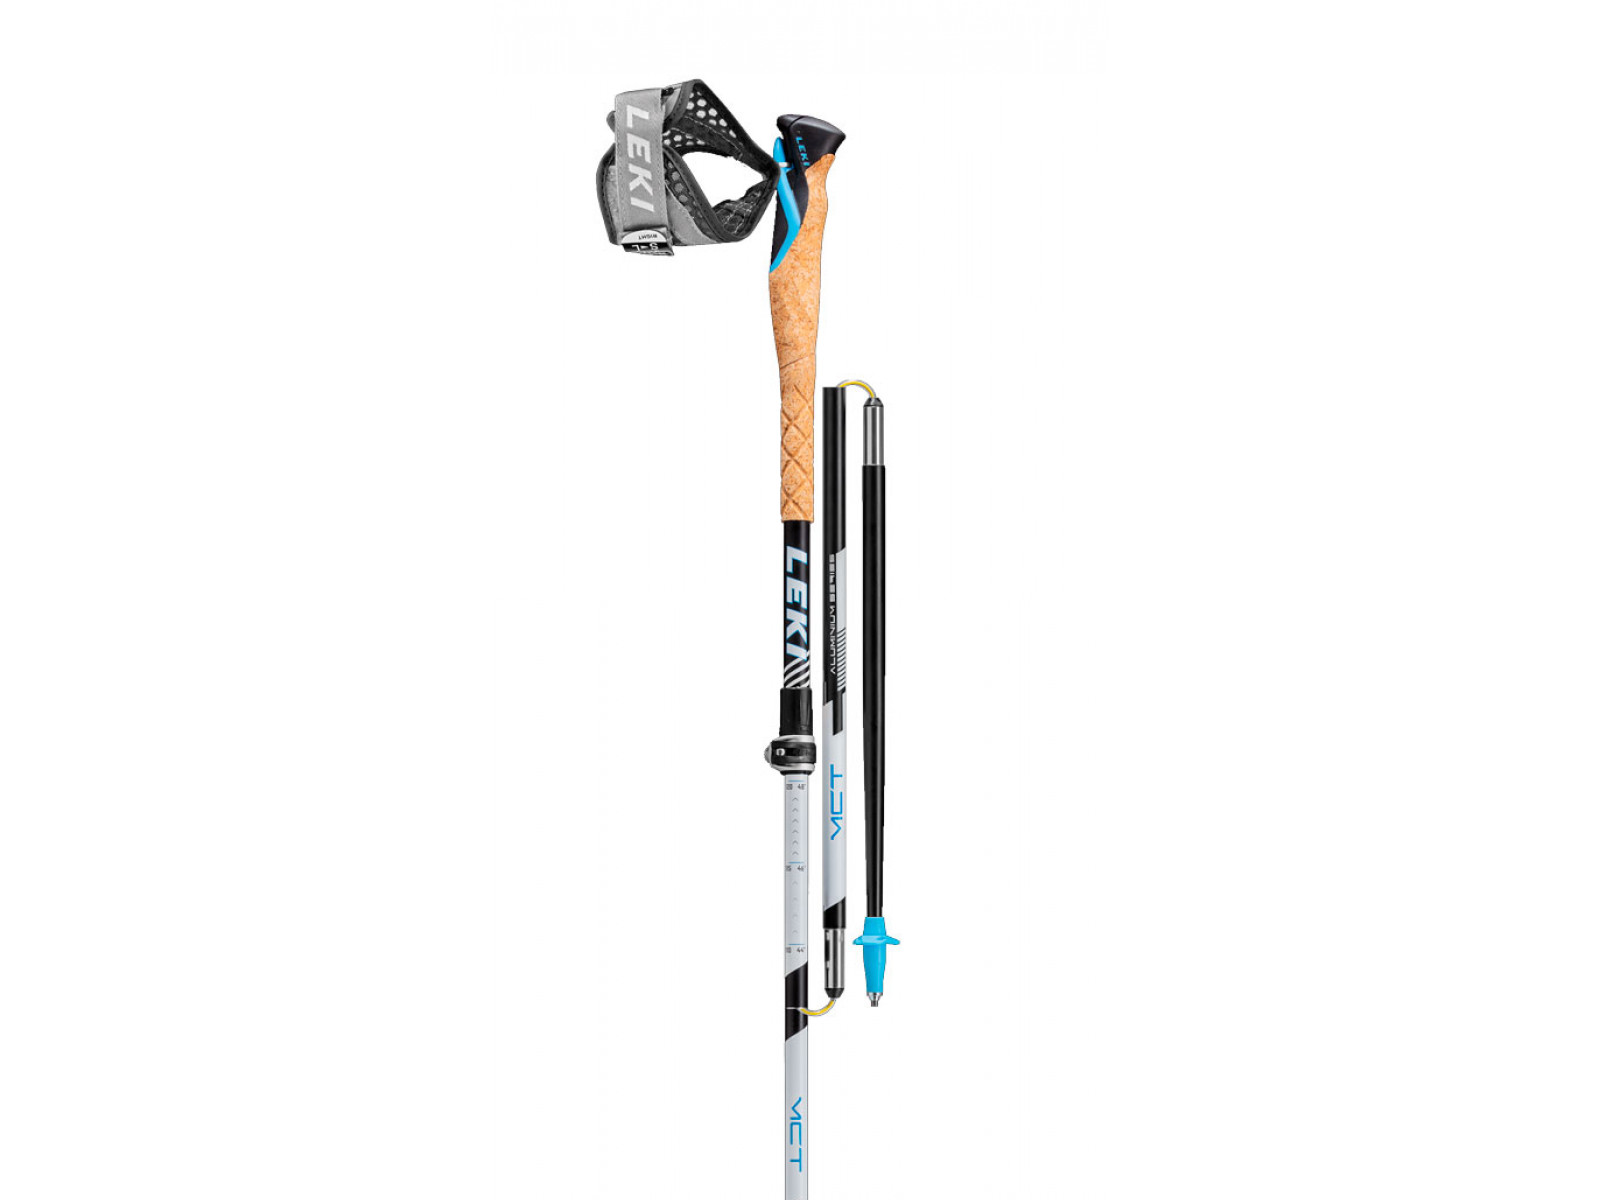 Leki MCT Vario TA Délka nastavitelných hůlek: 110-130 cm 2020/2021